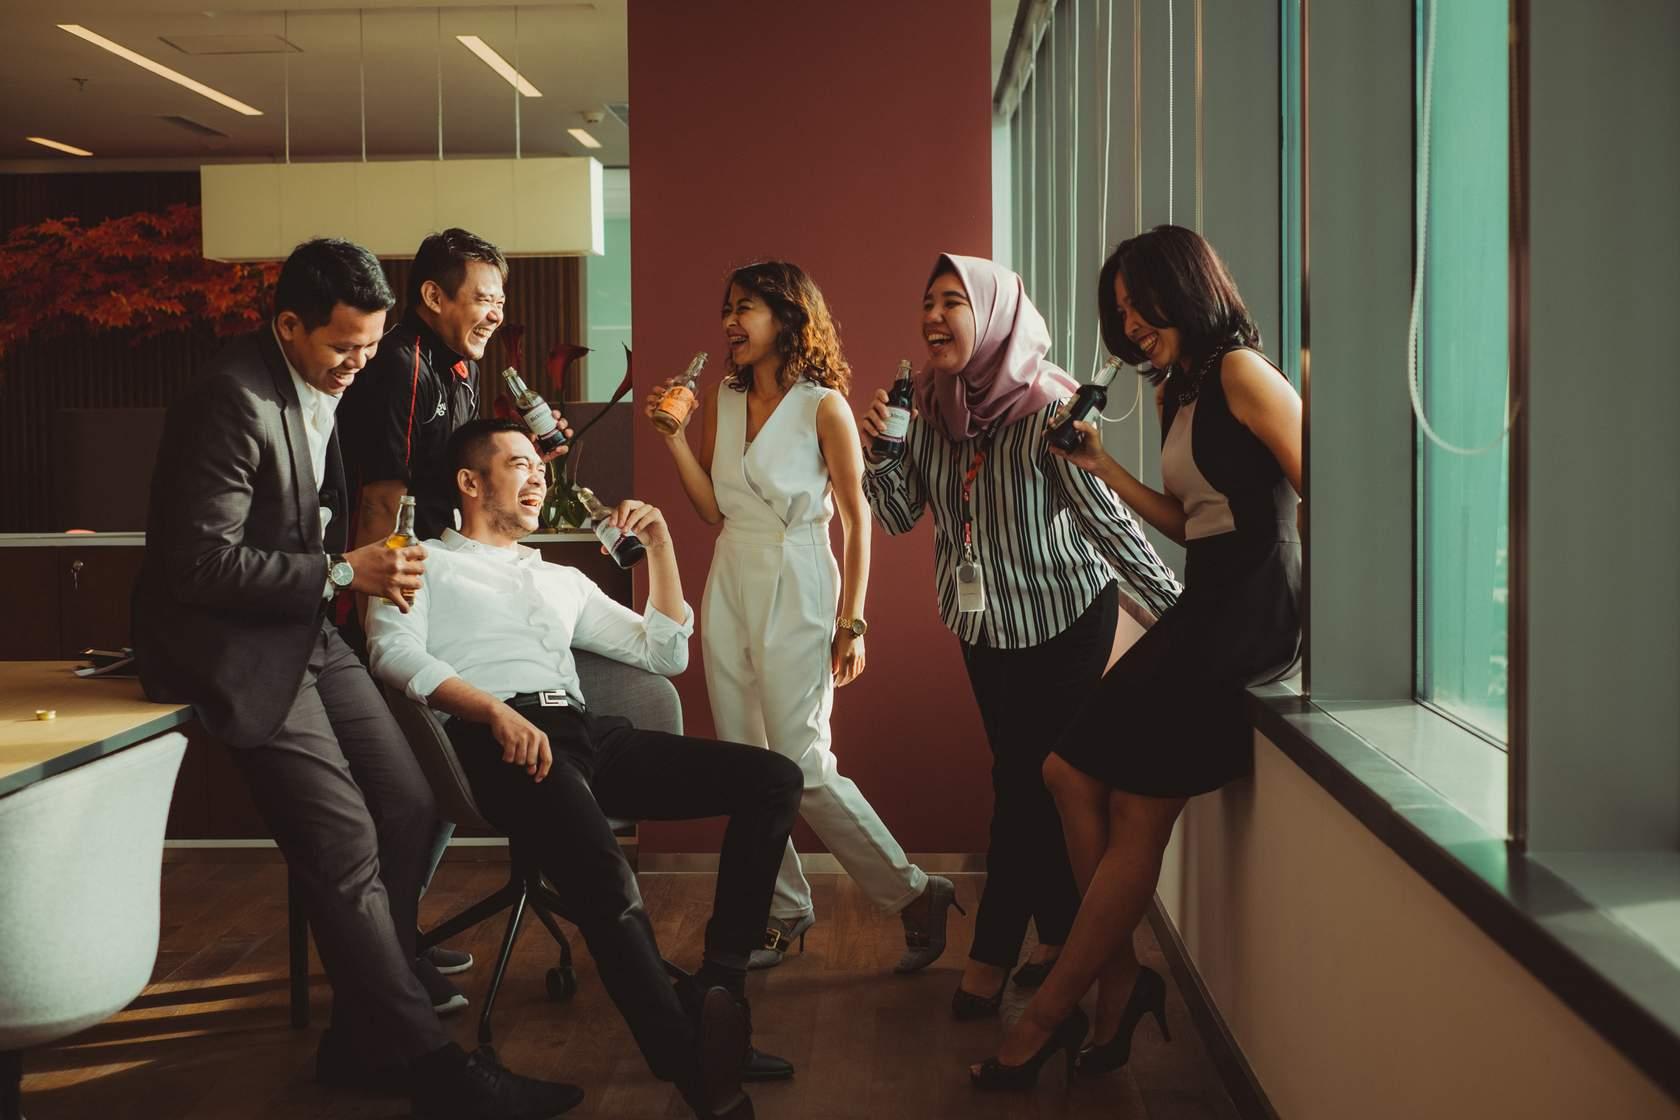 Course Image {mlang  en}Diversity & Inclusion at the Heart of Employee Engagement {mlang} {mlang de}Diversity & Inclusion- auf Vielfalt setzten {mlang}{mlang zh_cn}多样性是员工参与的核心{mlang}